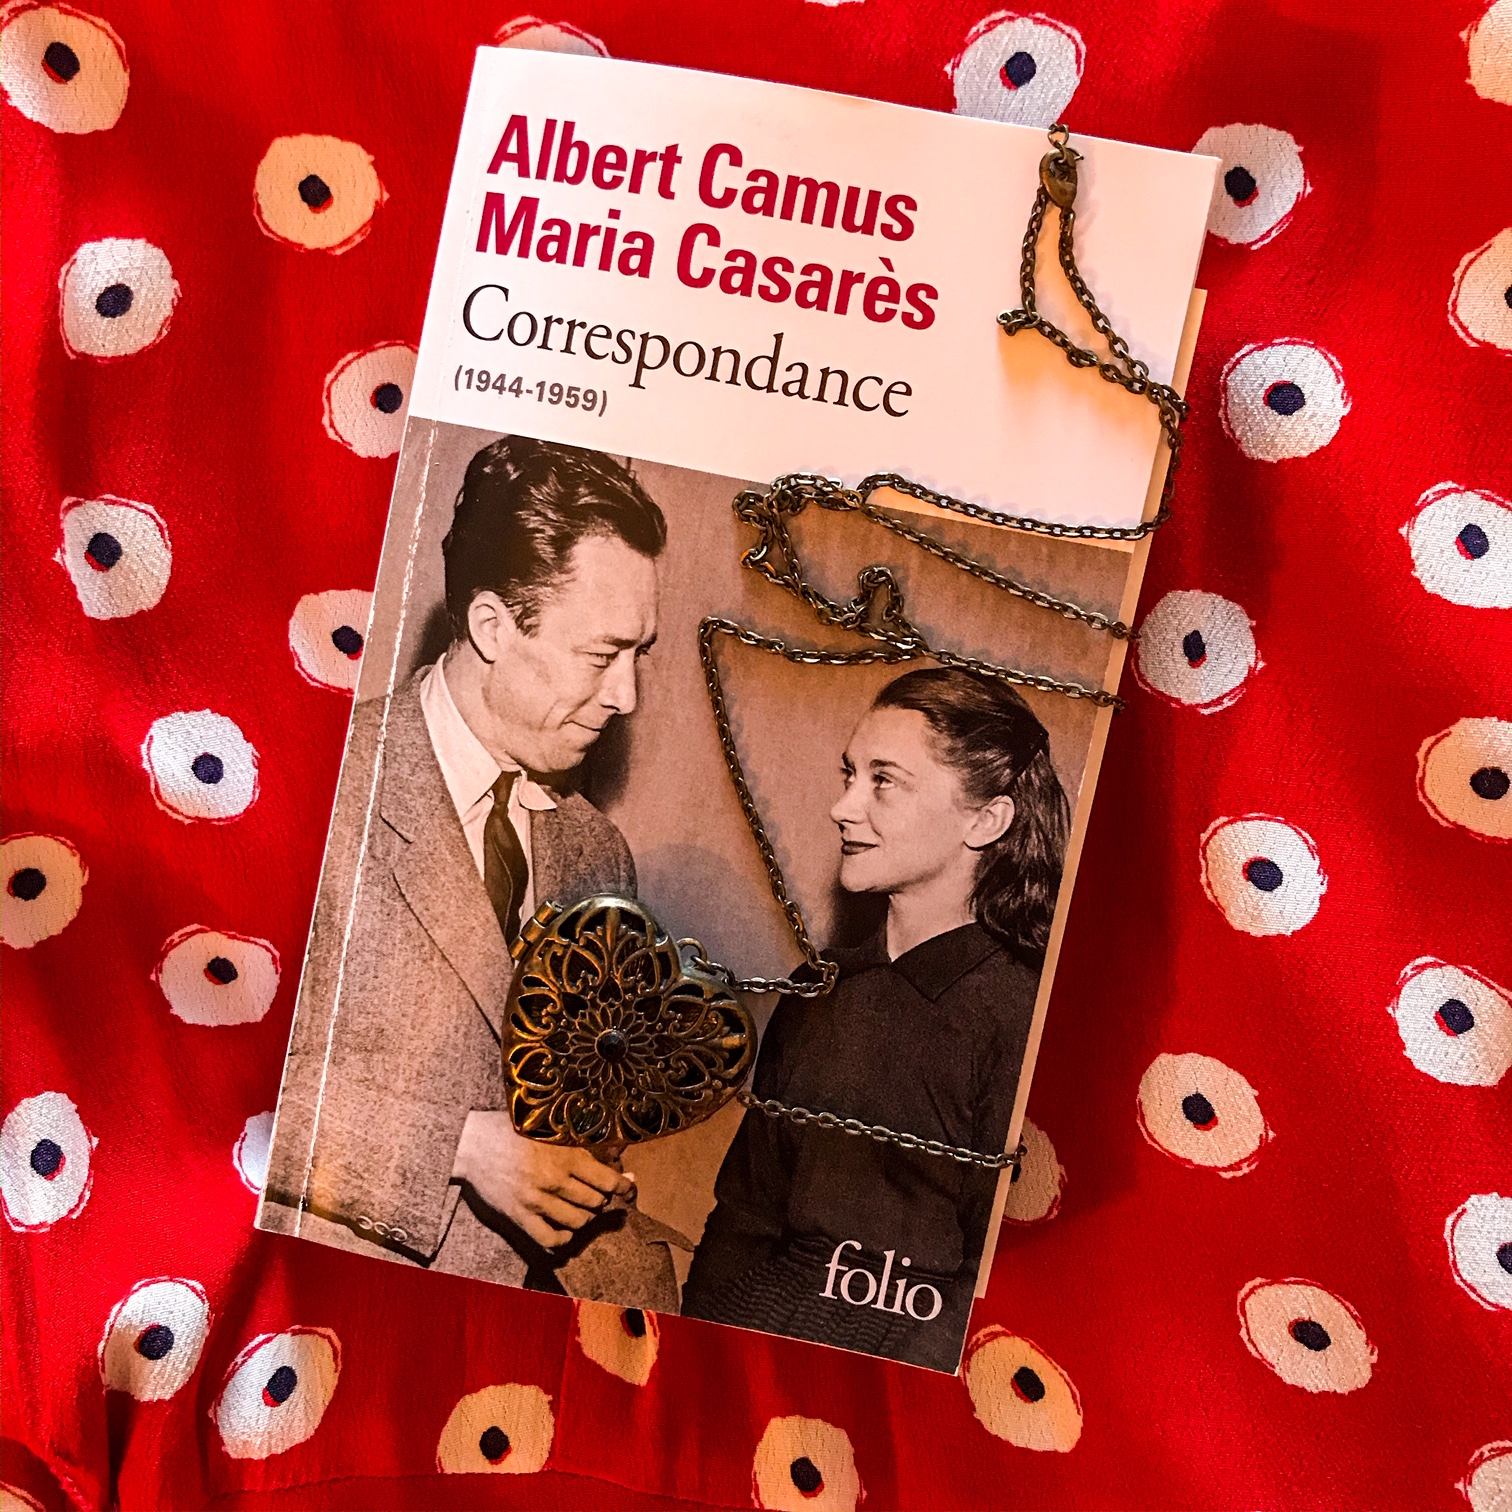 Correspondance (1944-1960) d'Albert Camus et Maria Casarès : Tu me vertiges